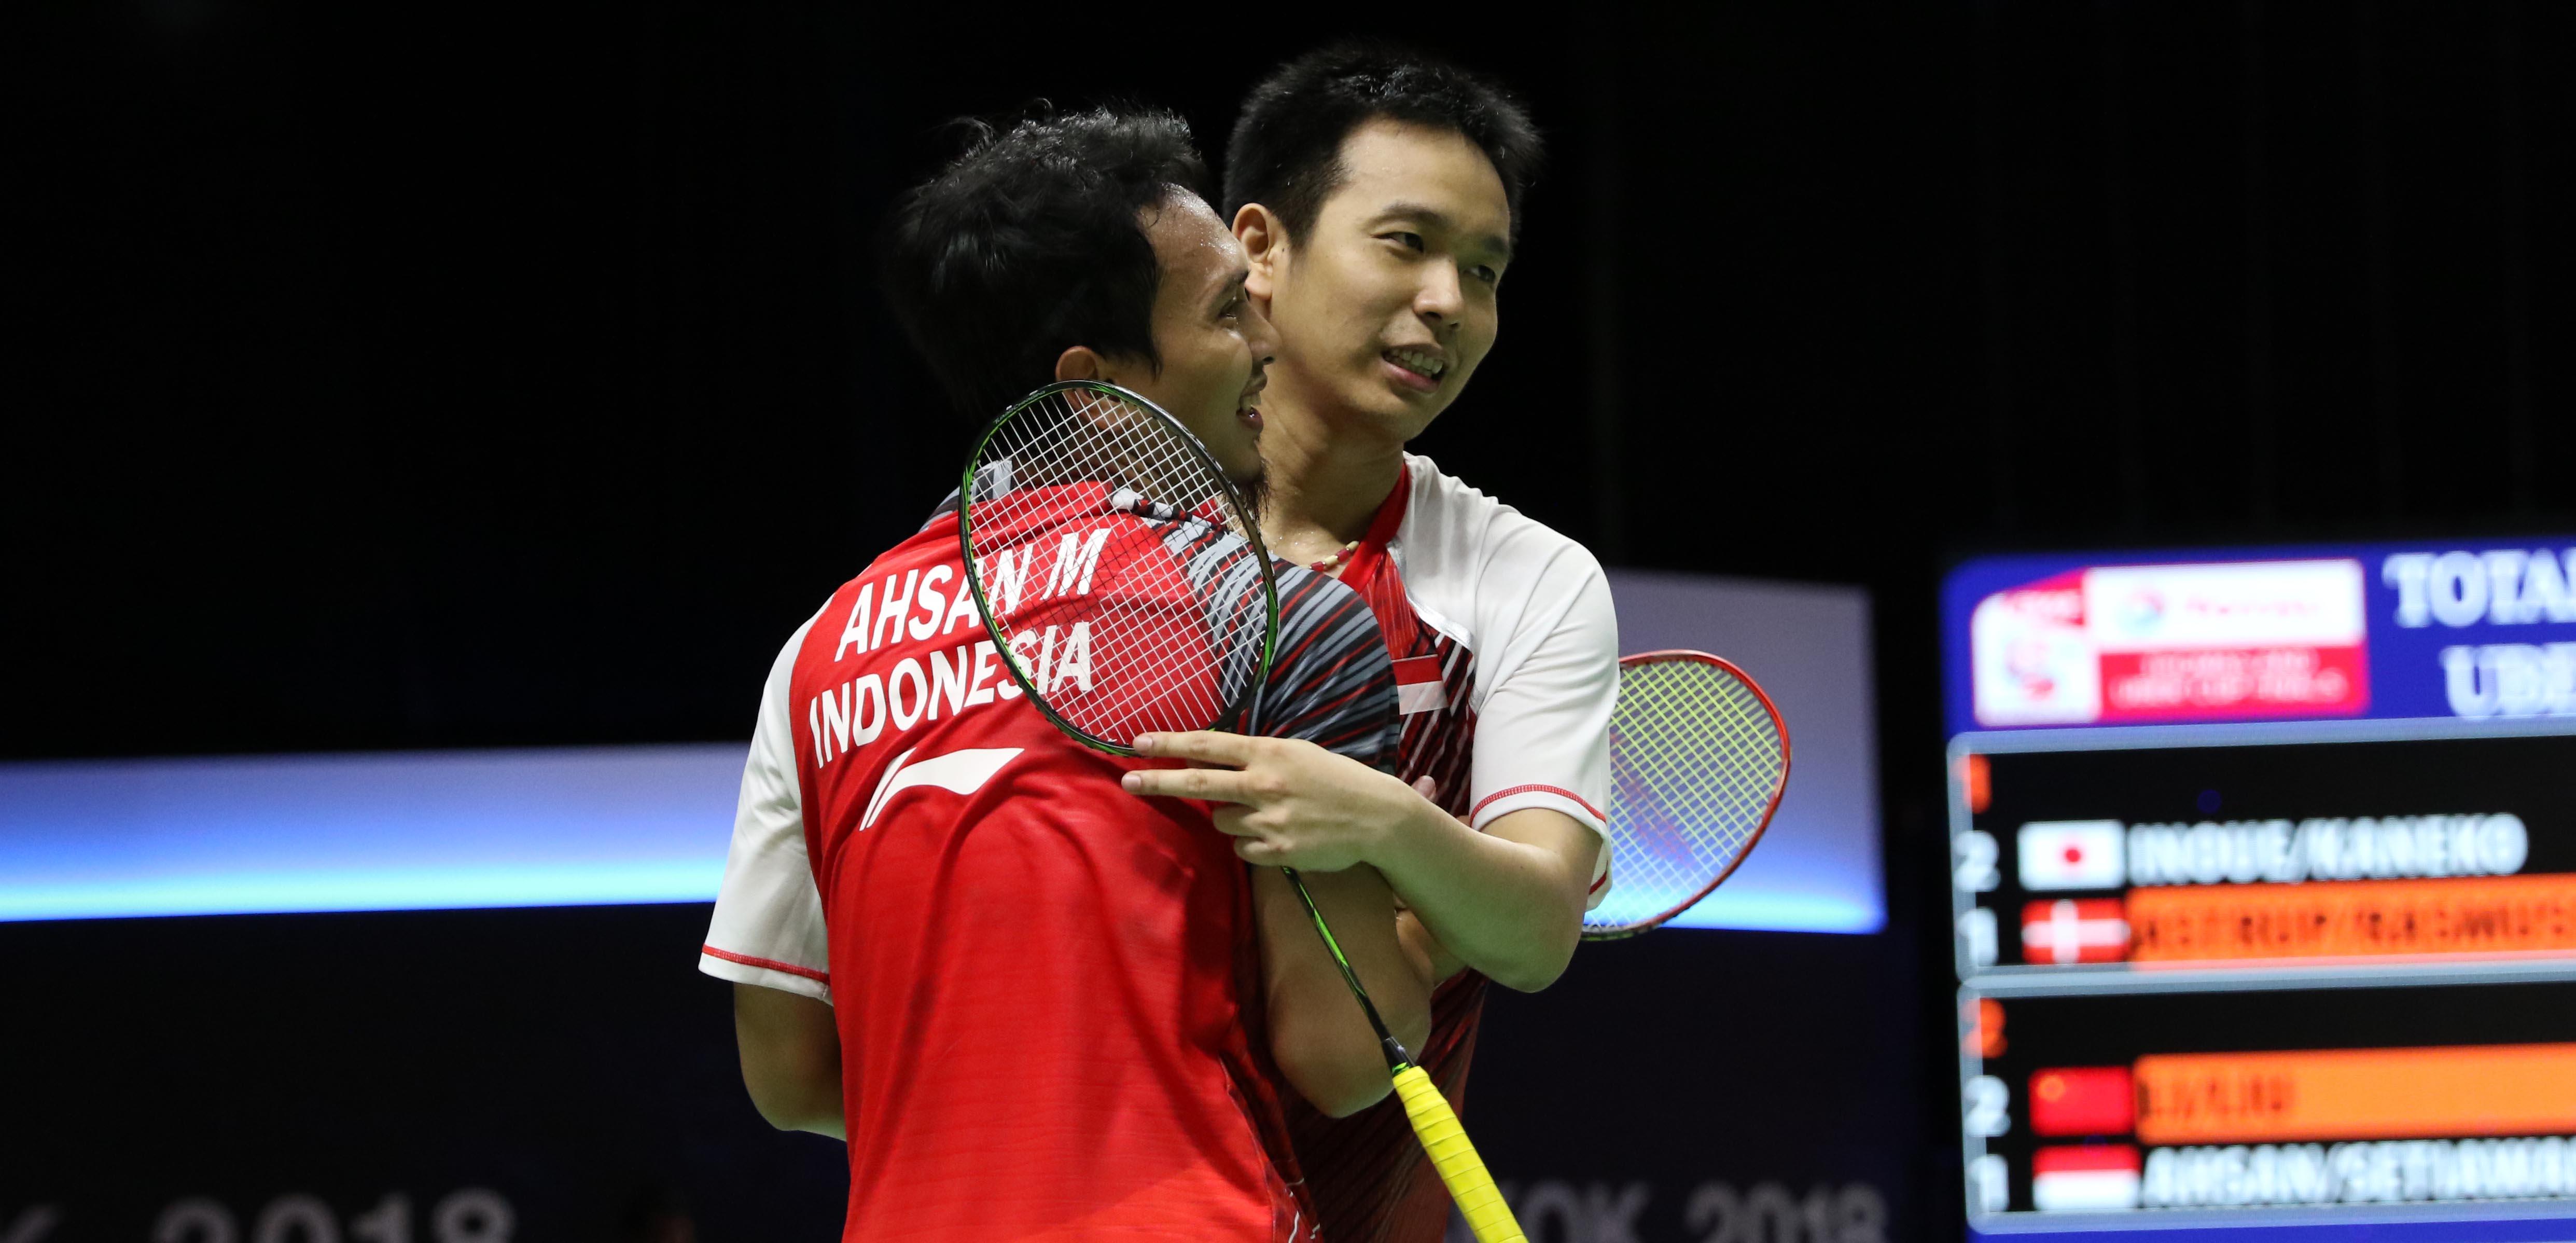 Ahsan/Hendra saat berlaga di Partai keempat (Sumber: PBSI / http://m.badmintonindonesia.org)